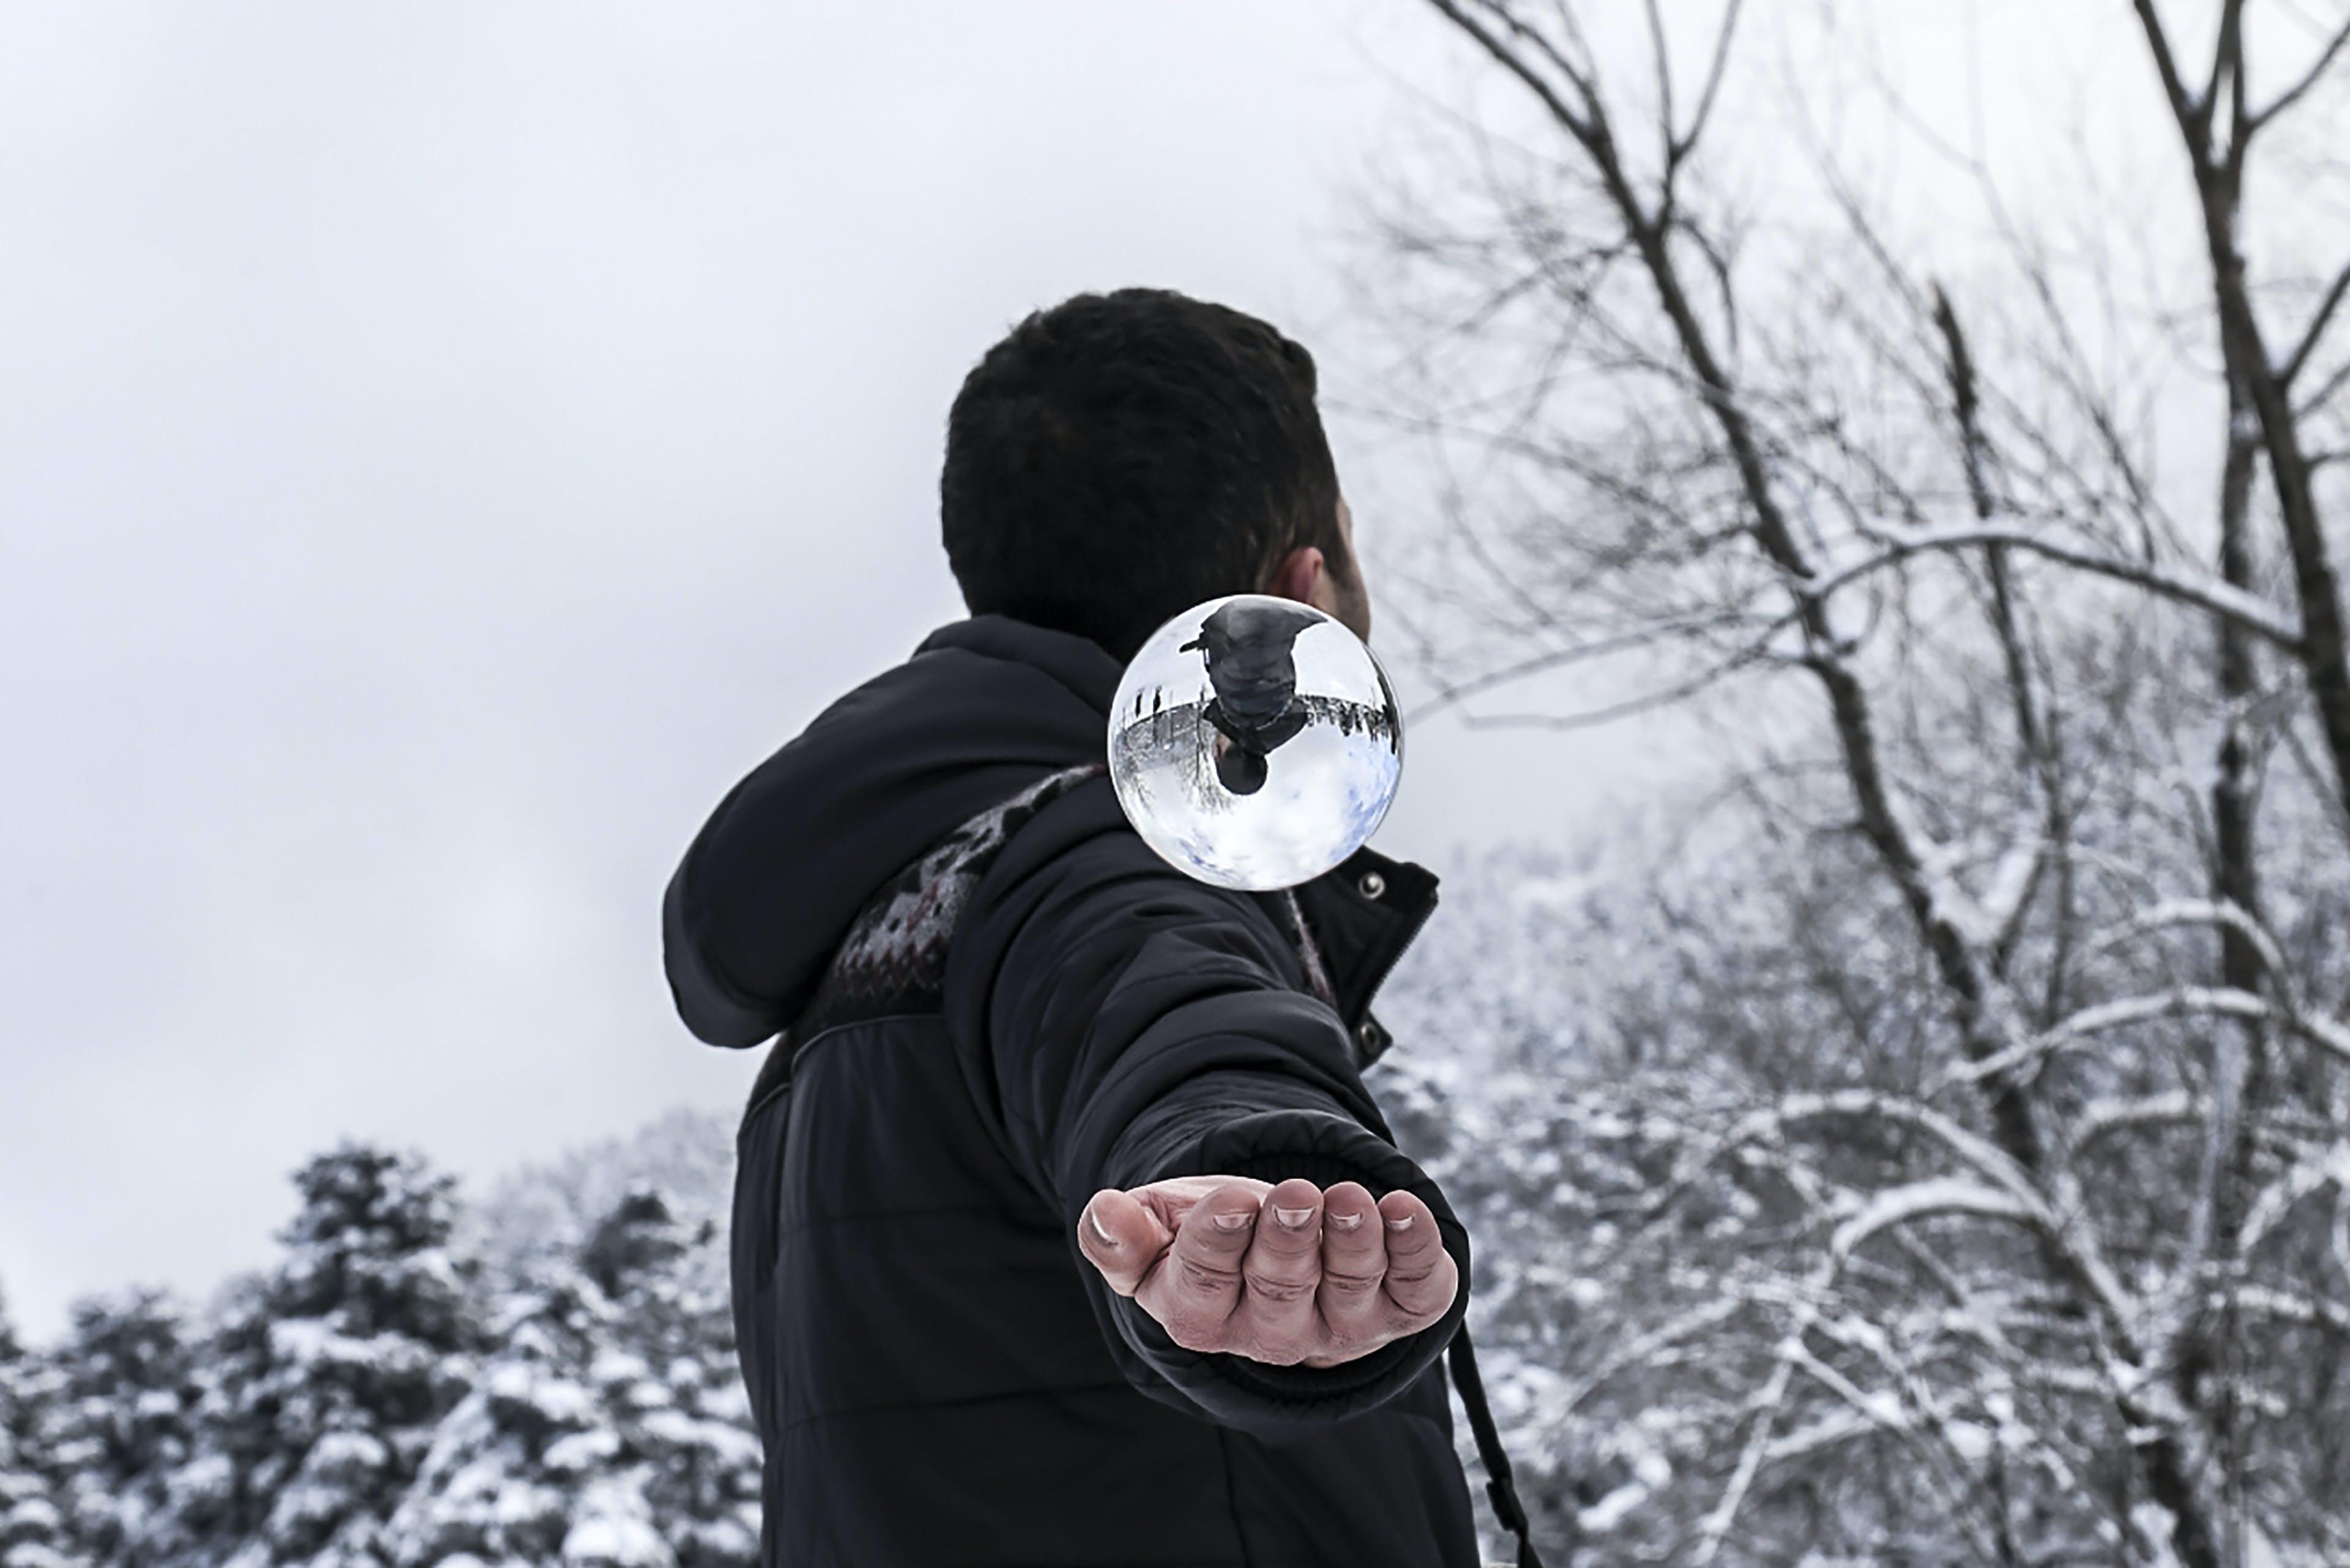 Man in Black Hoodie during Snow Weather at Daytime